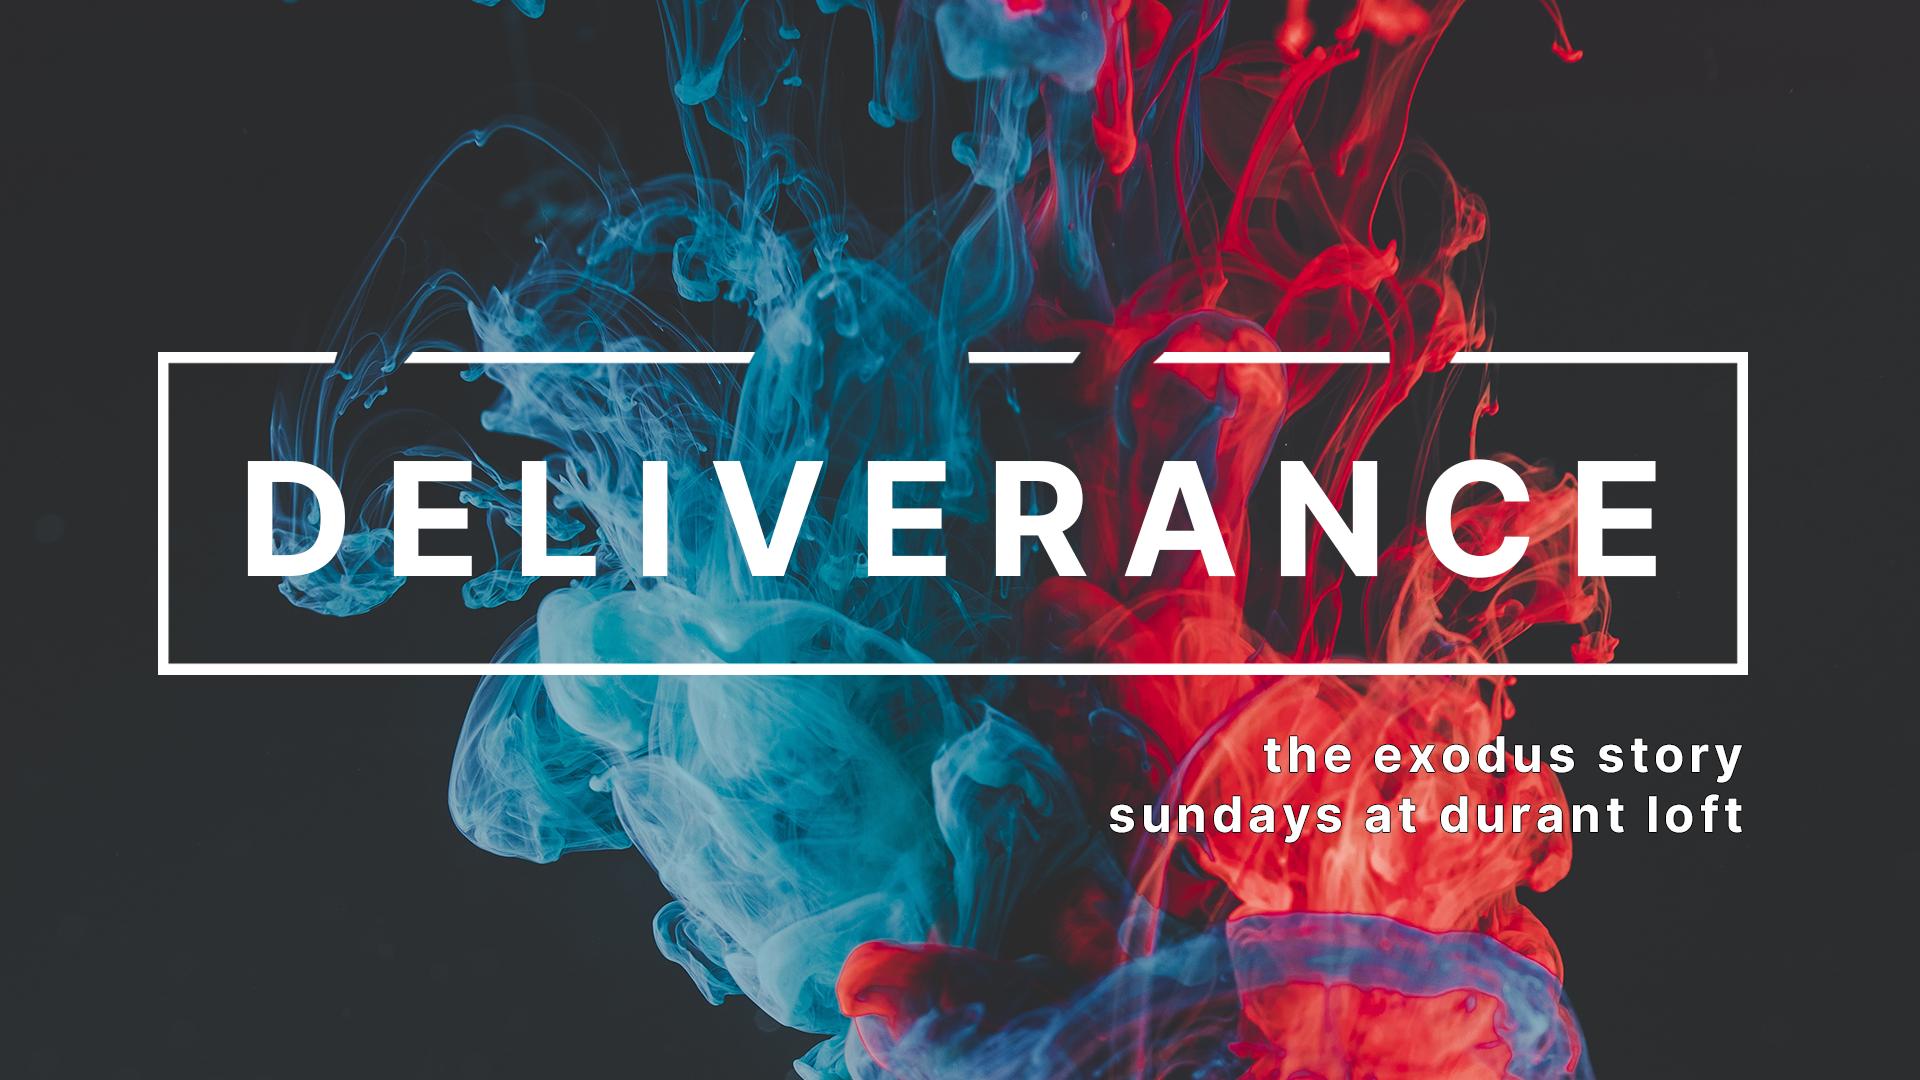 deliverance_exodus_series_klesis_berkeley_sunday